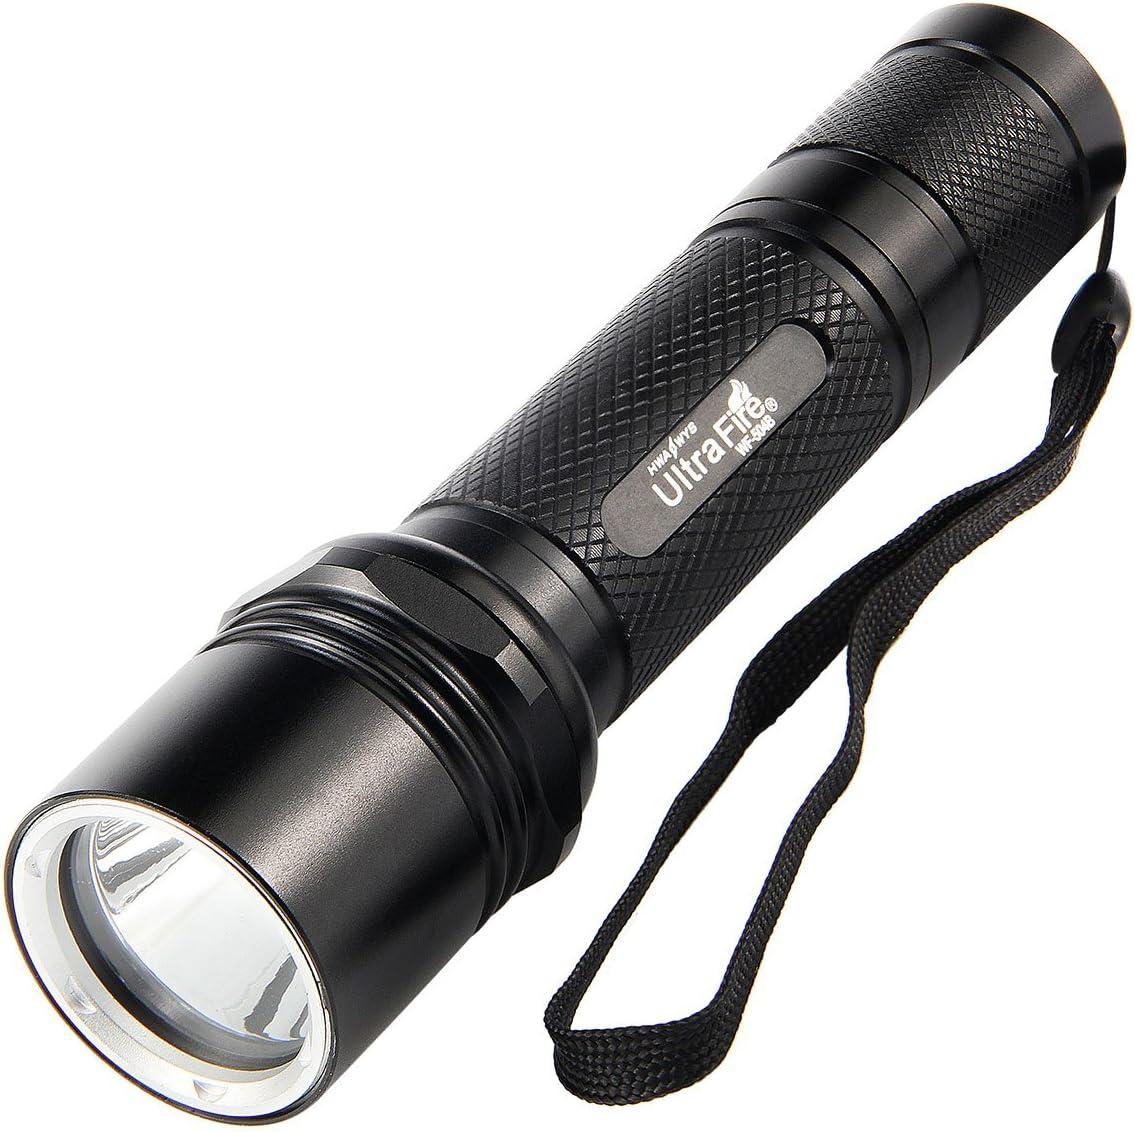 ULTRAFIRE Ultra Bright Magnetic Based LED Camping and Emergency Lantern … (Flashlight)